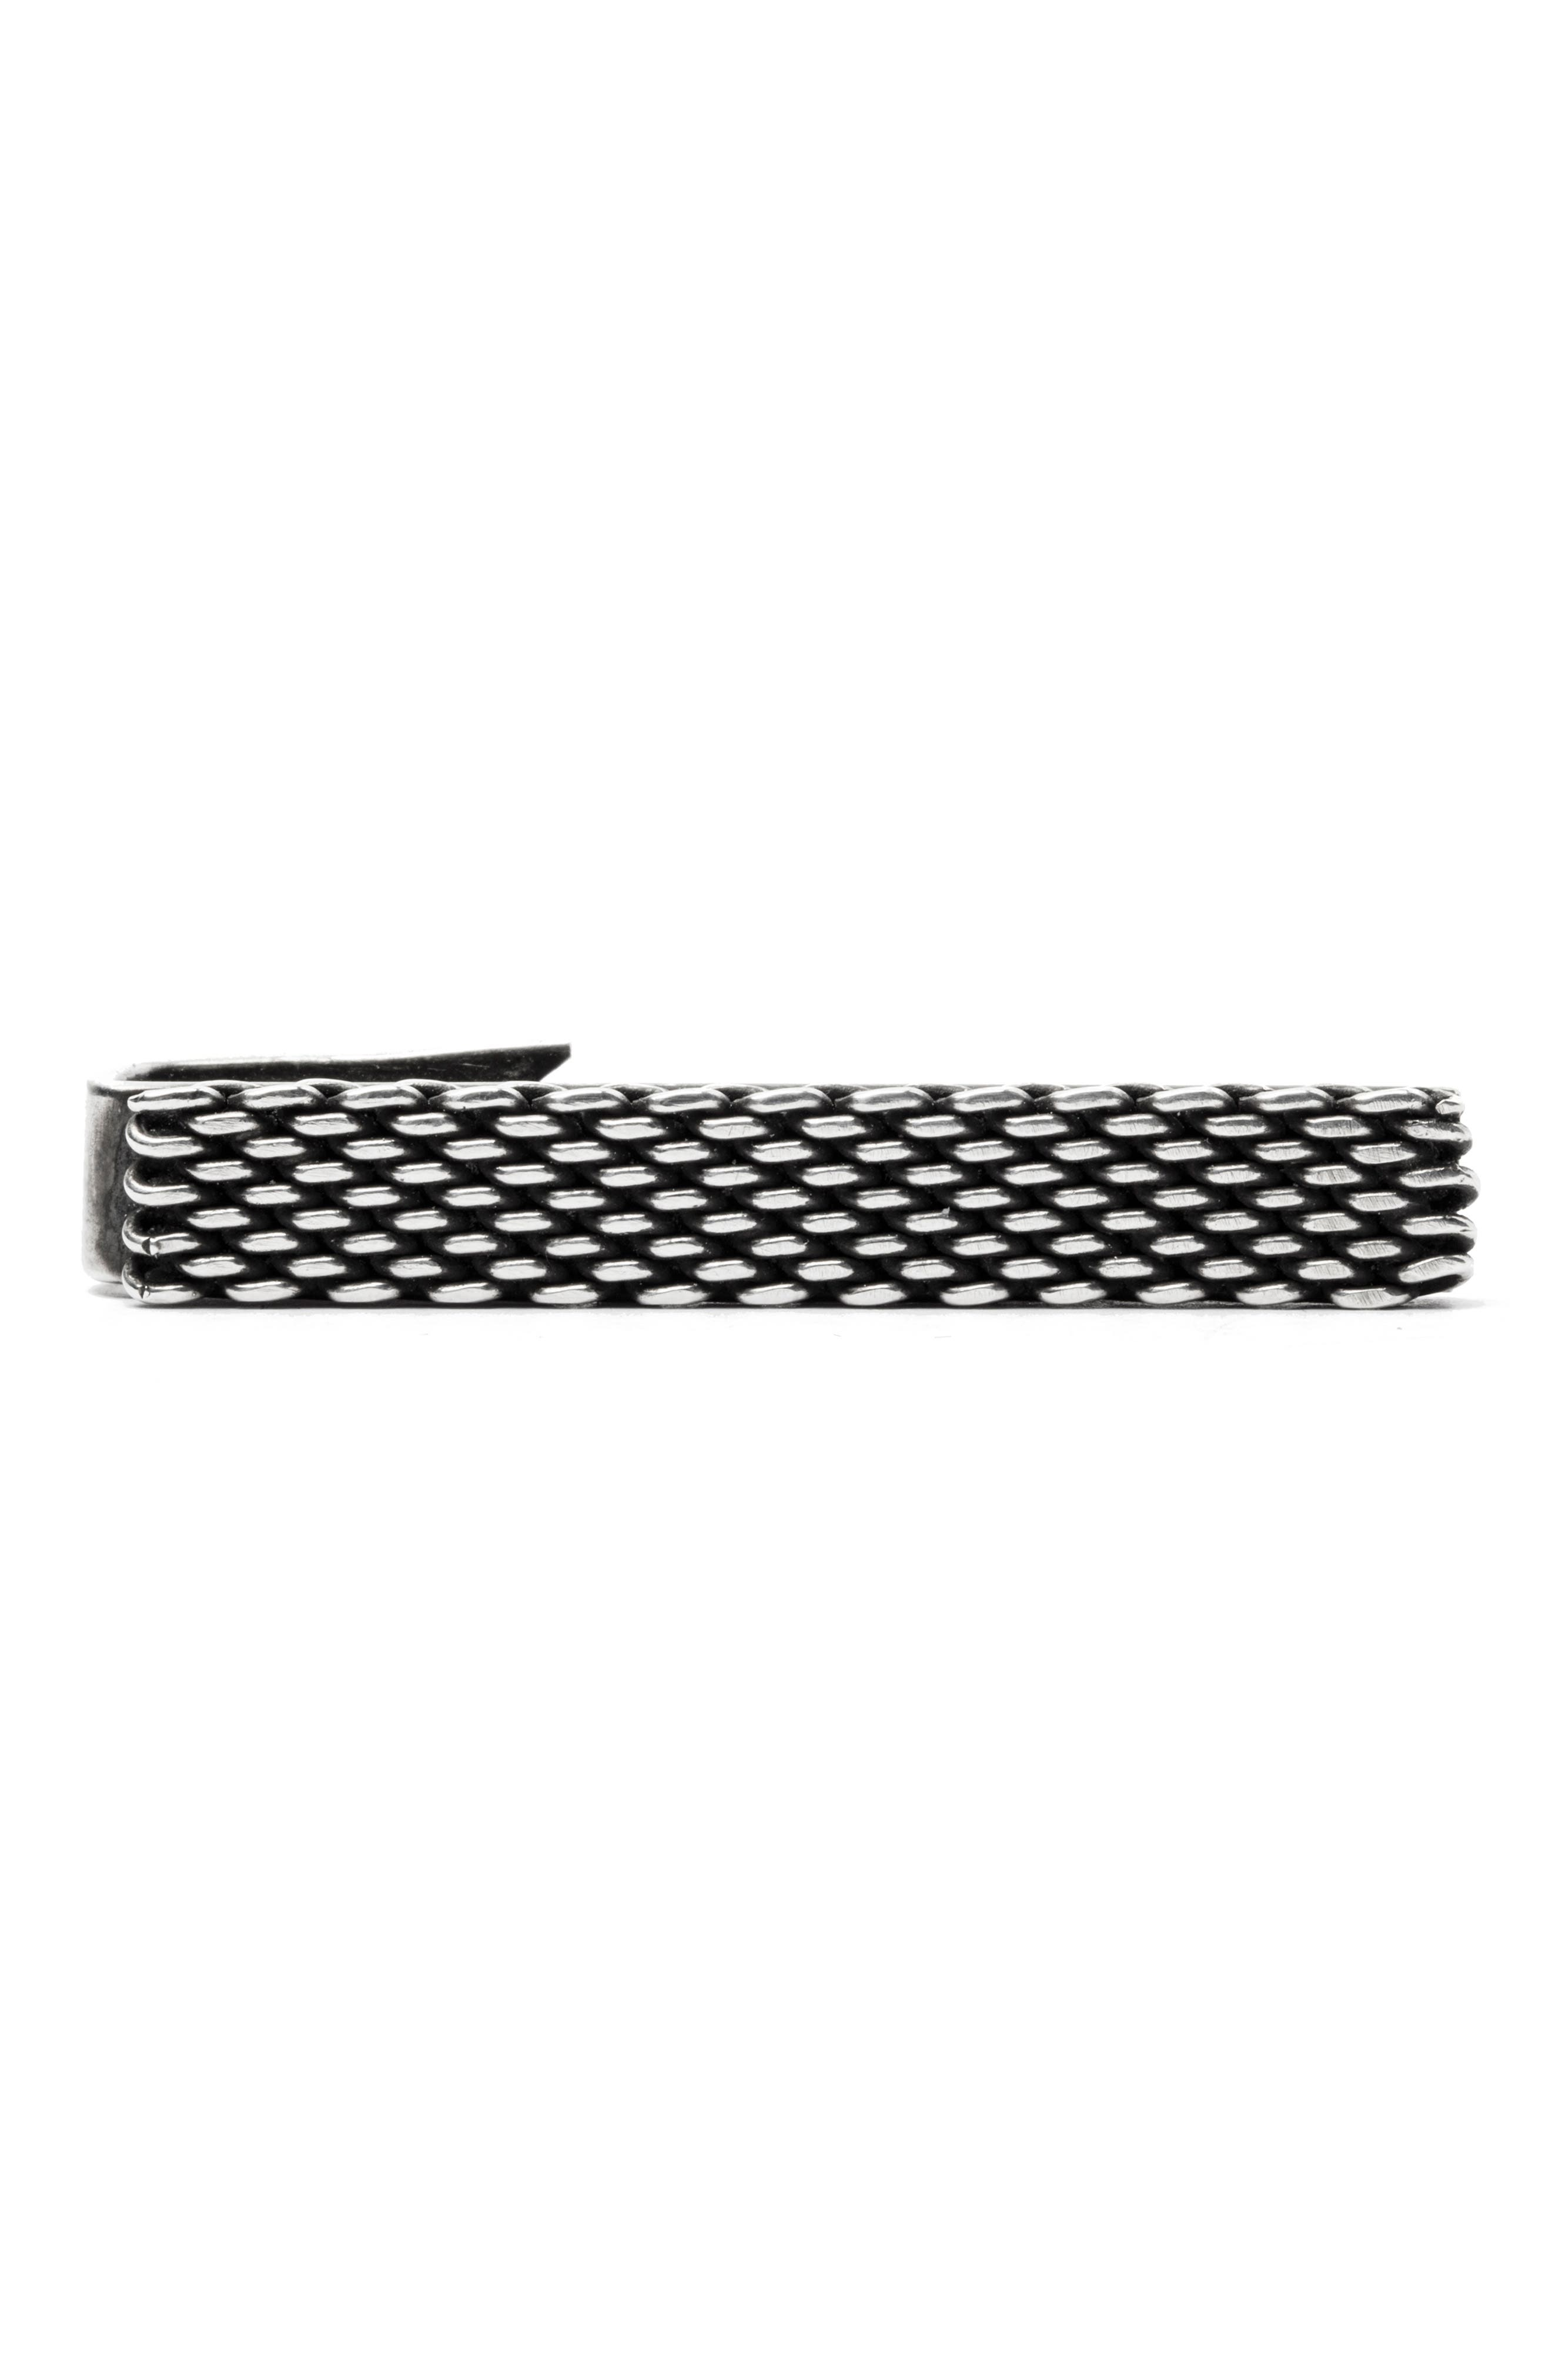 Mesh Band Tie Clip,                             Main thumbnail 1, color,                             SILVER